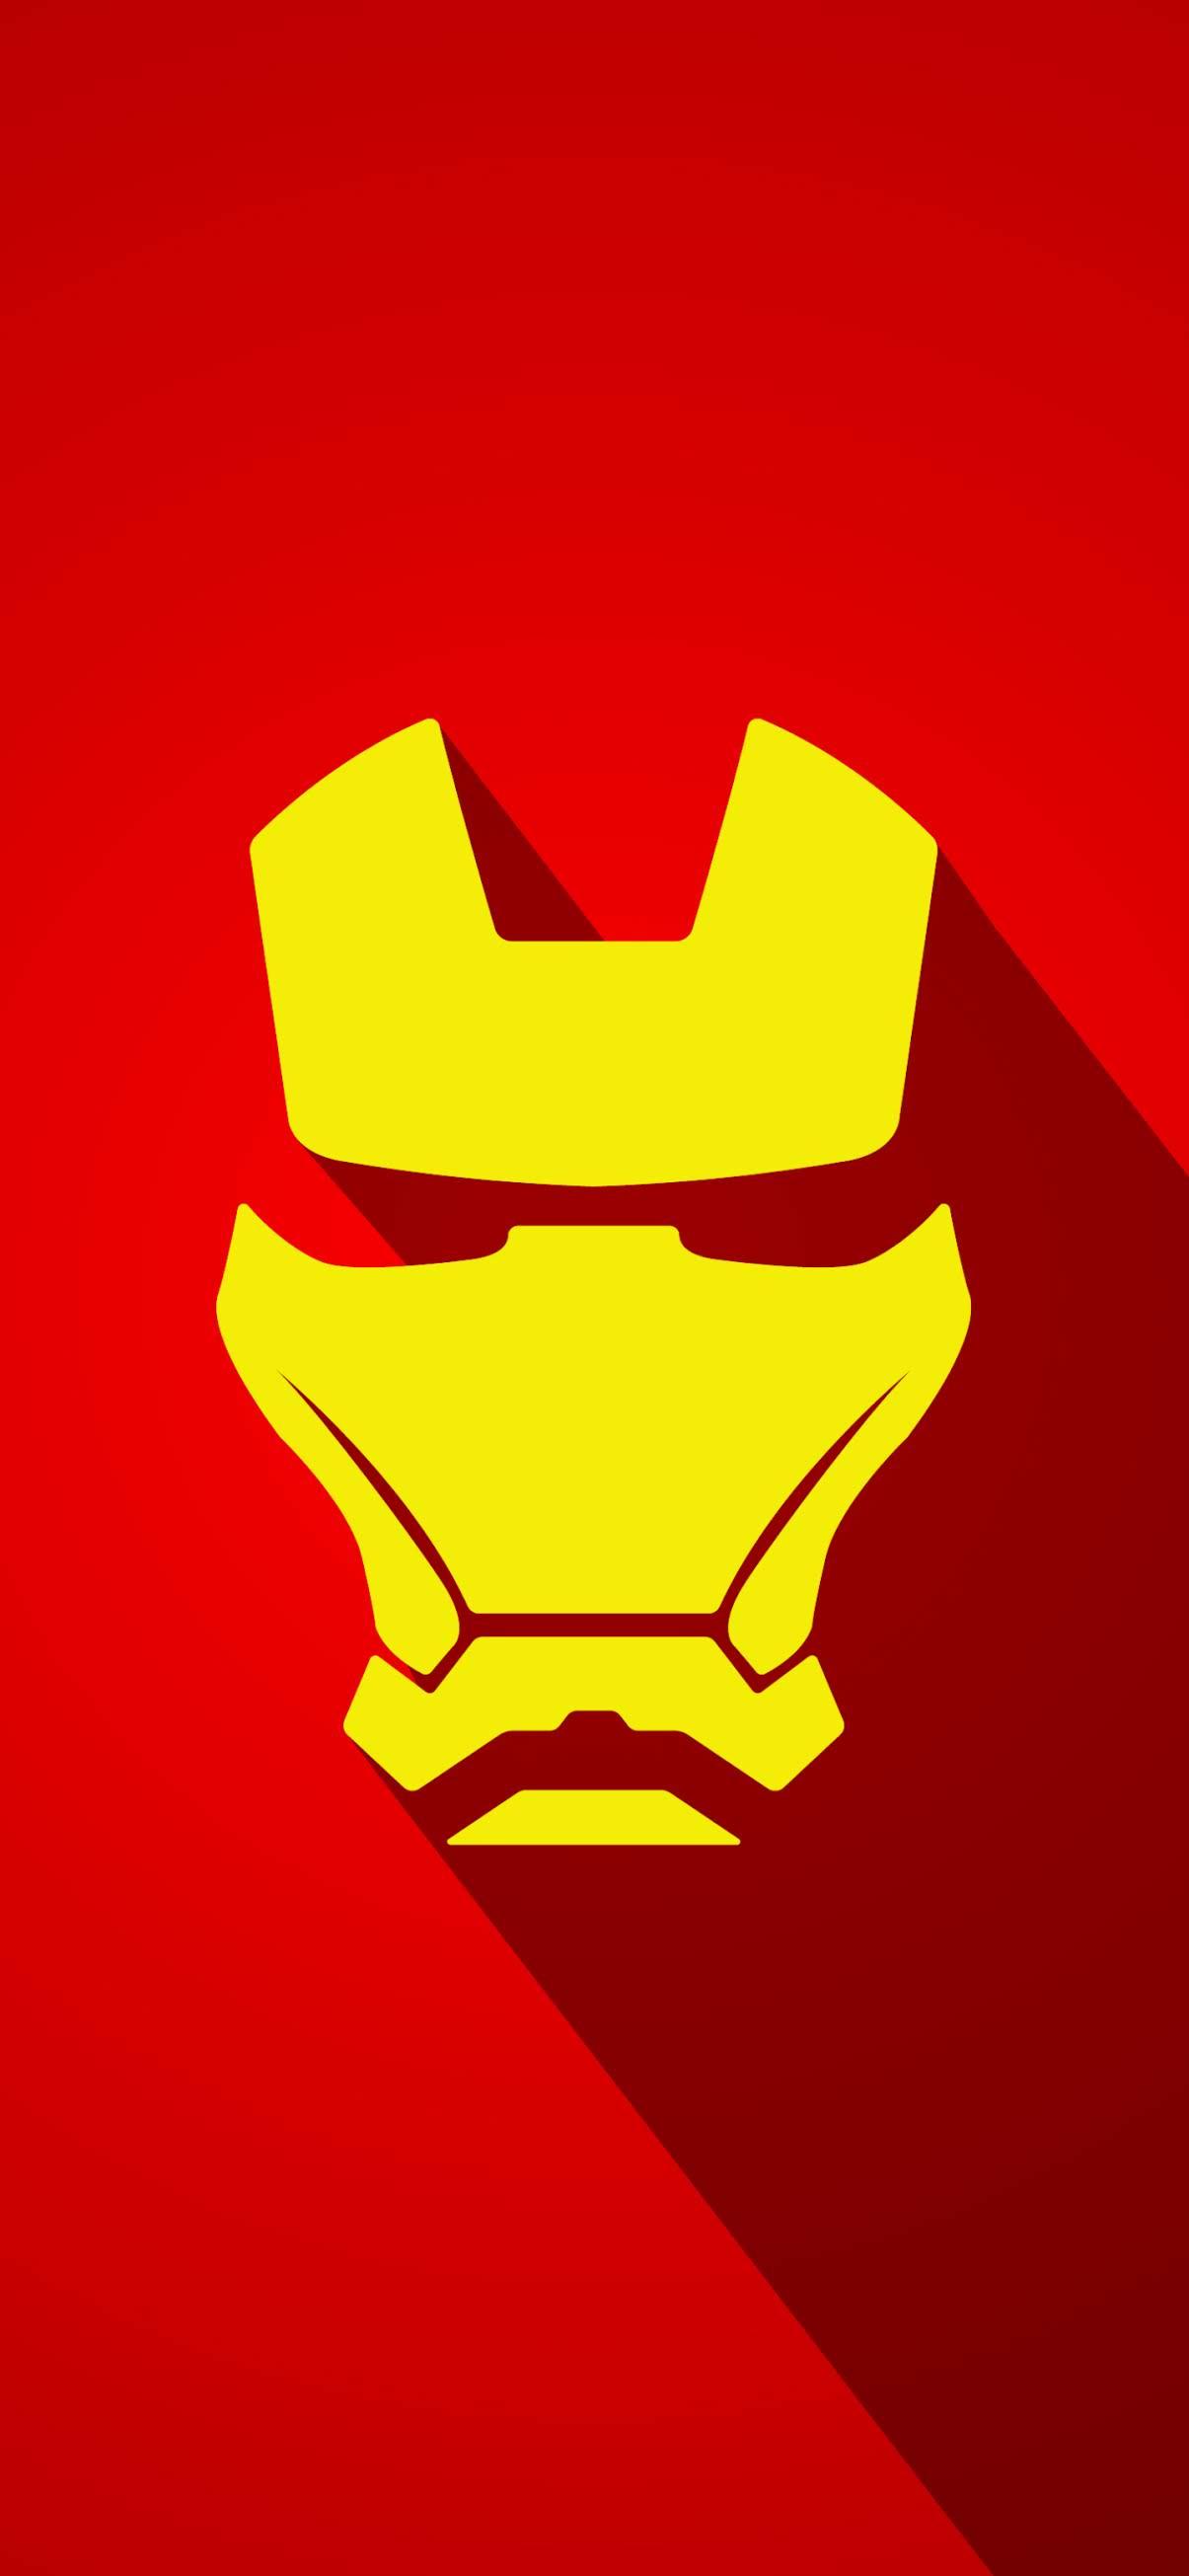 Iron Man mask minimalist mobile wallpaper